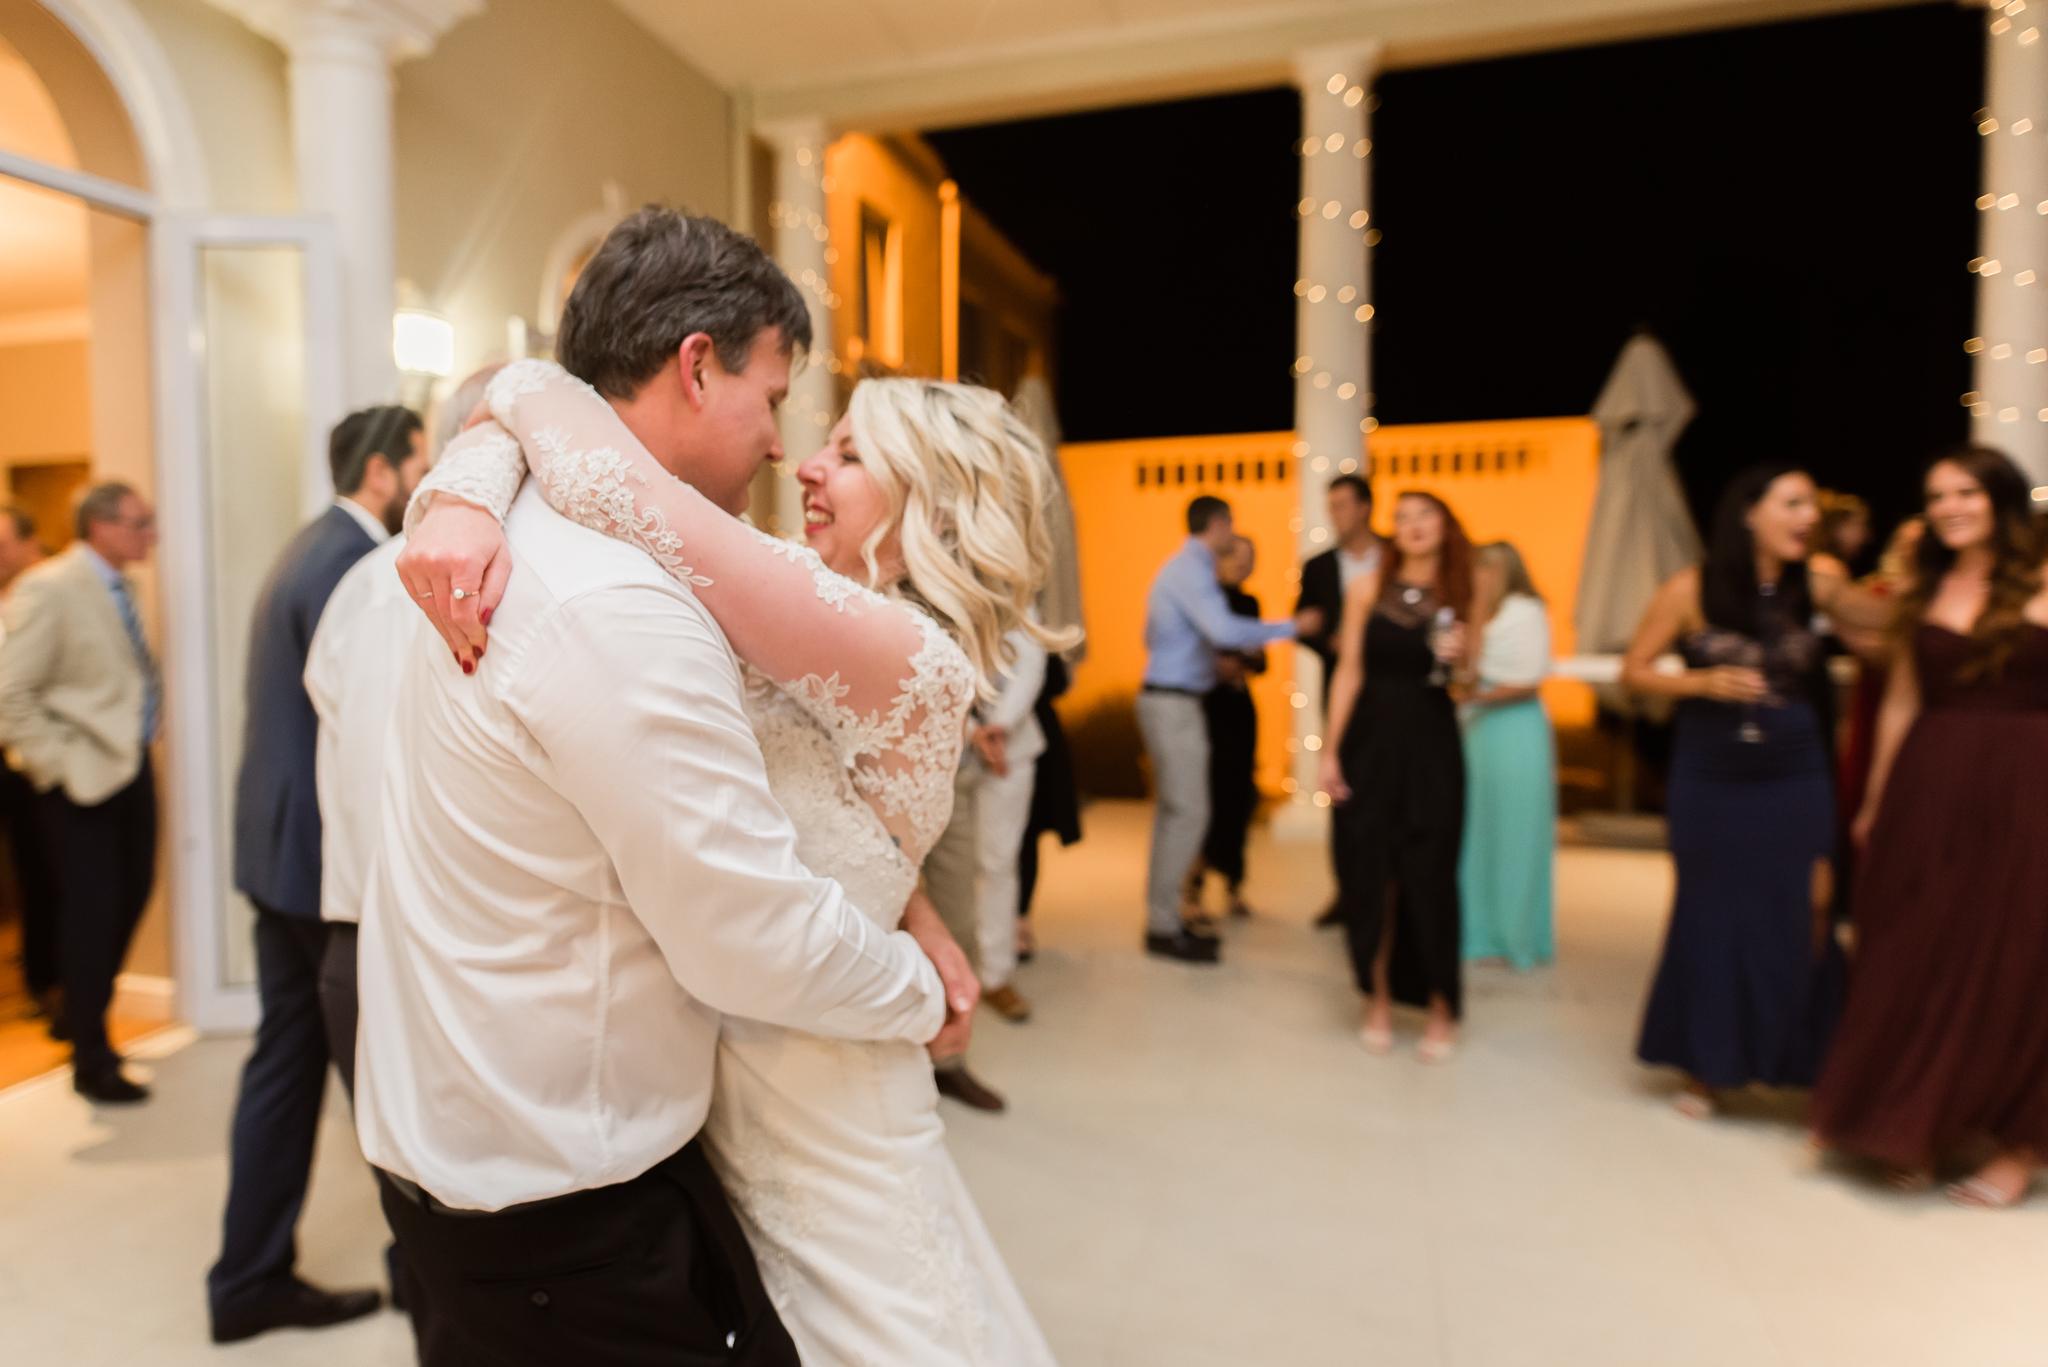 Angelique_Smith_Photography_Pieter&Yvonne_Wedding-551.jpg